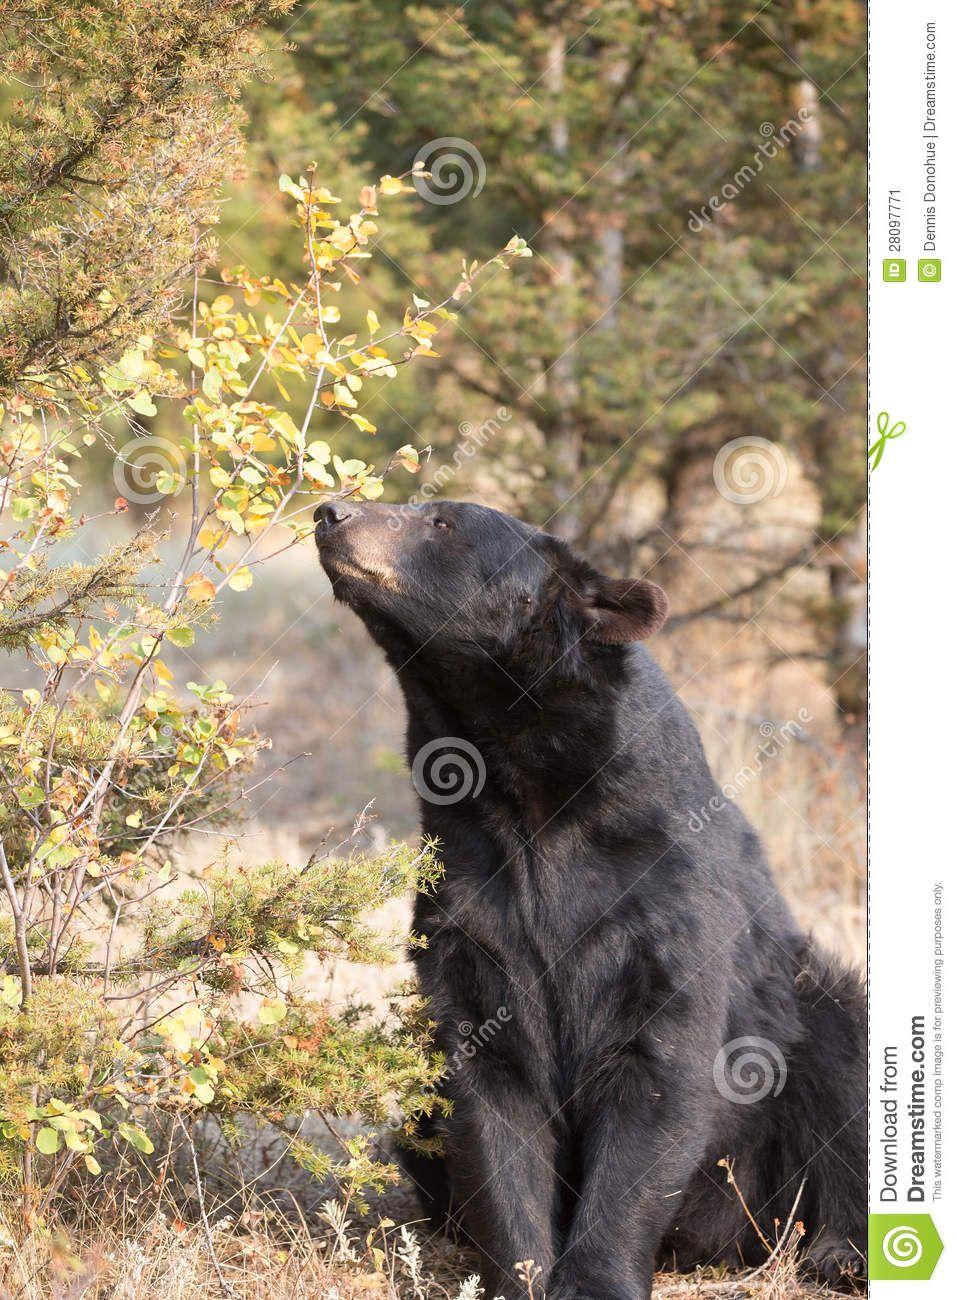 American Black Bear In Northern Woods Stock Image - Image: 28097771